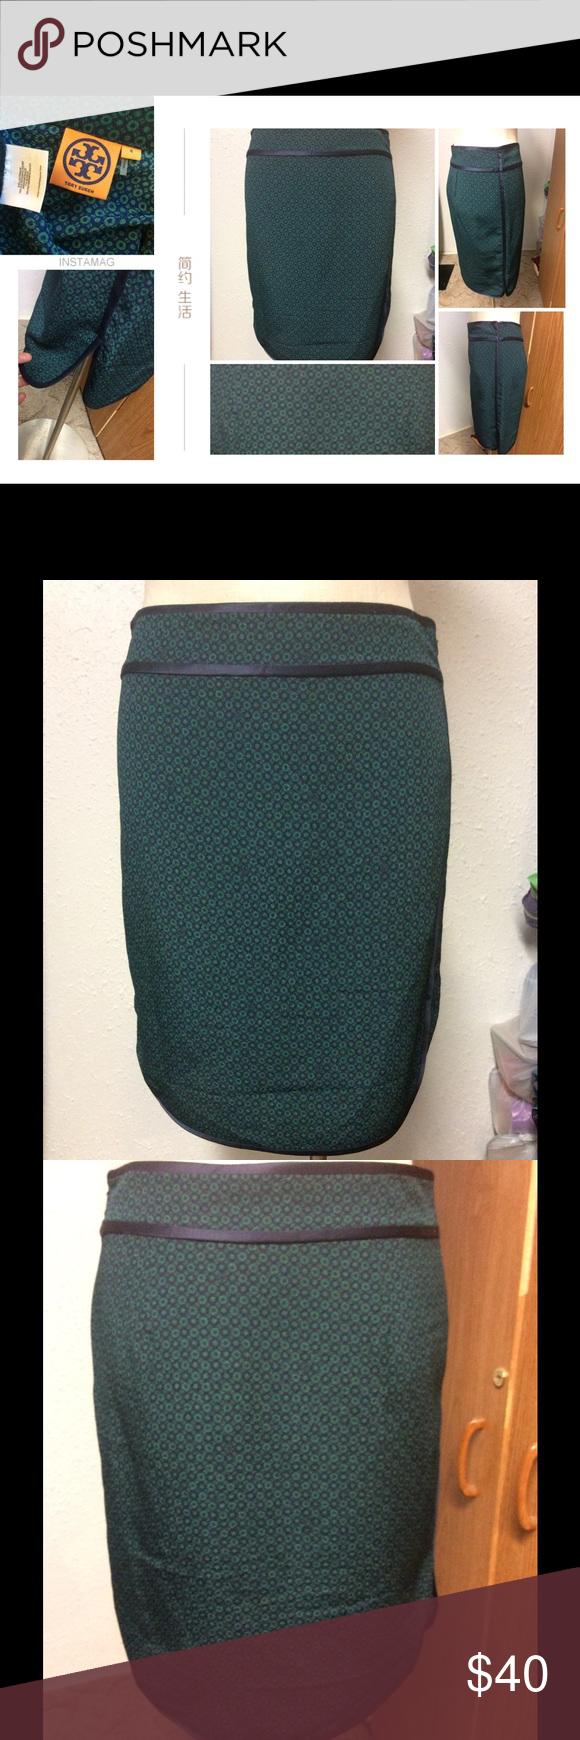 Tory Burch skirt 🏁 Green & Blue skirt. Side slit. Polyester & silk. Final markdown. Bundle for further discount. Tory Burch Skirts Midi